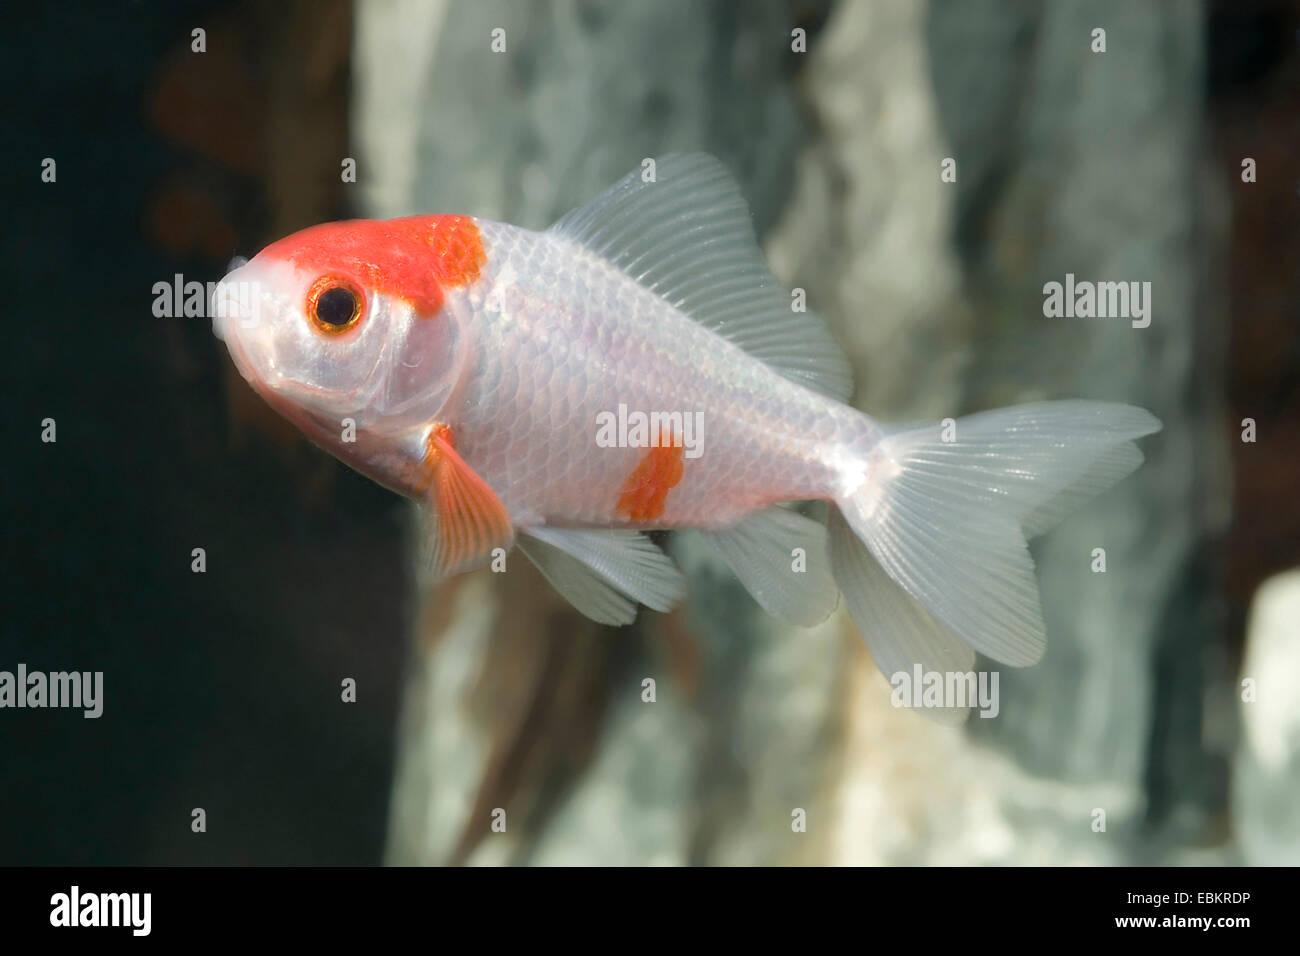 goldfish, common carp (Carassius auratus), breed Sarasa-doubletail Stock Photo